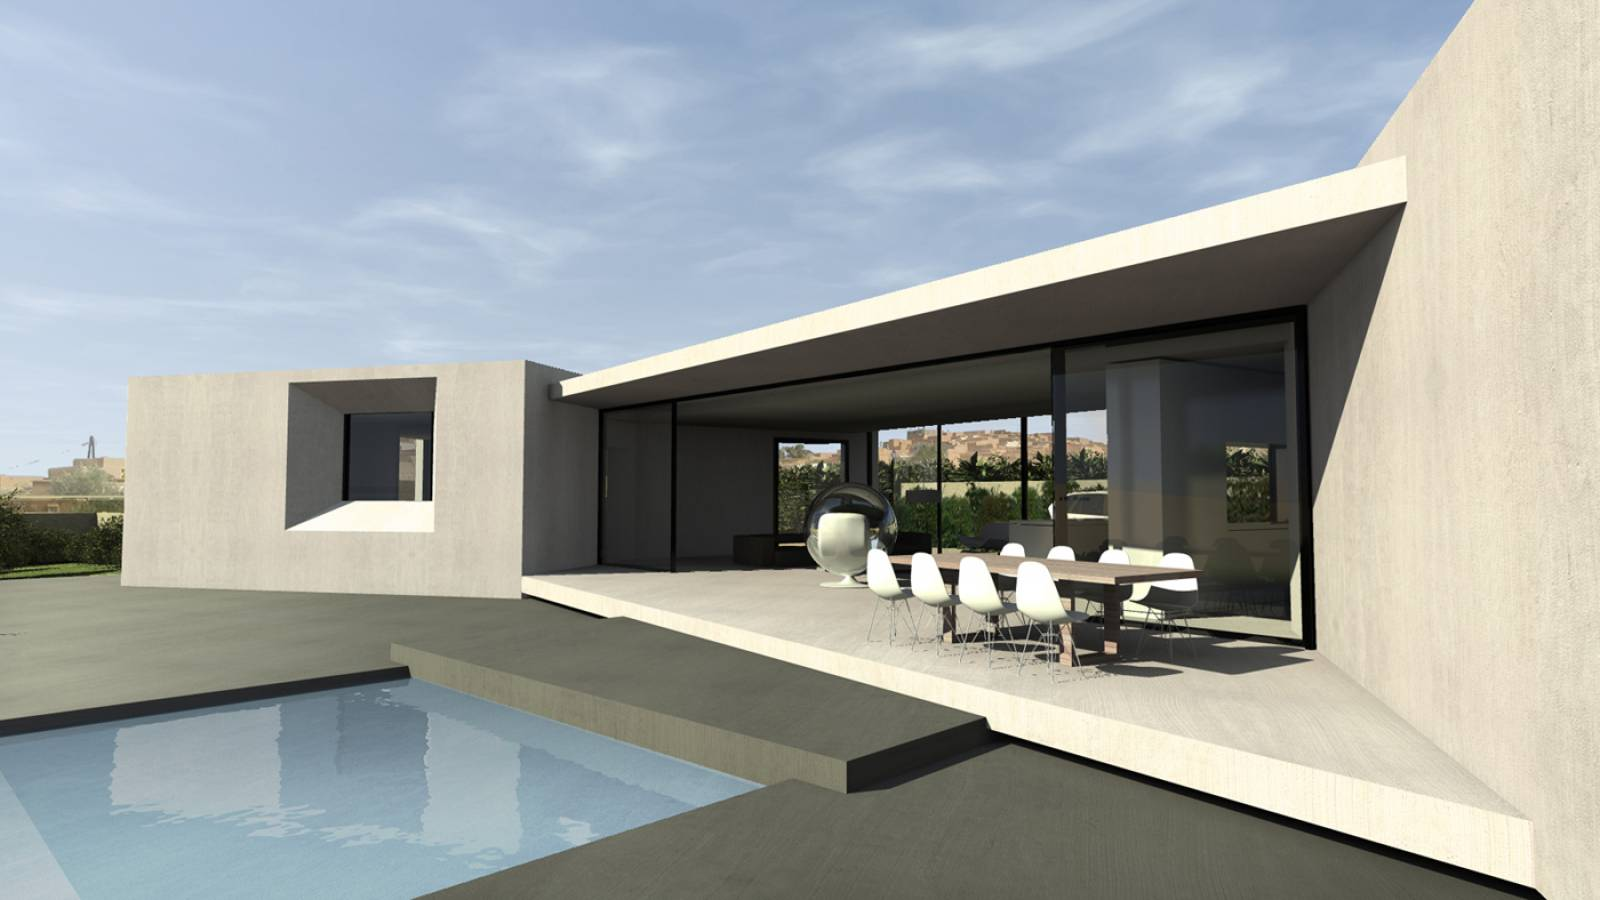 villa d 39 architecte n pr s detigmi au maroc architecte a2 sb. Black Bedroom Furniture Sets. Home Design Ideas